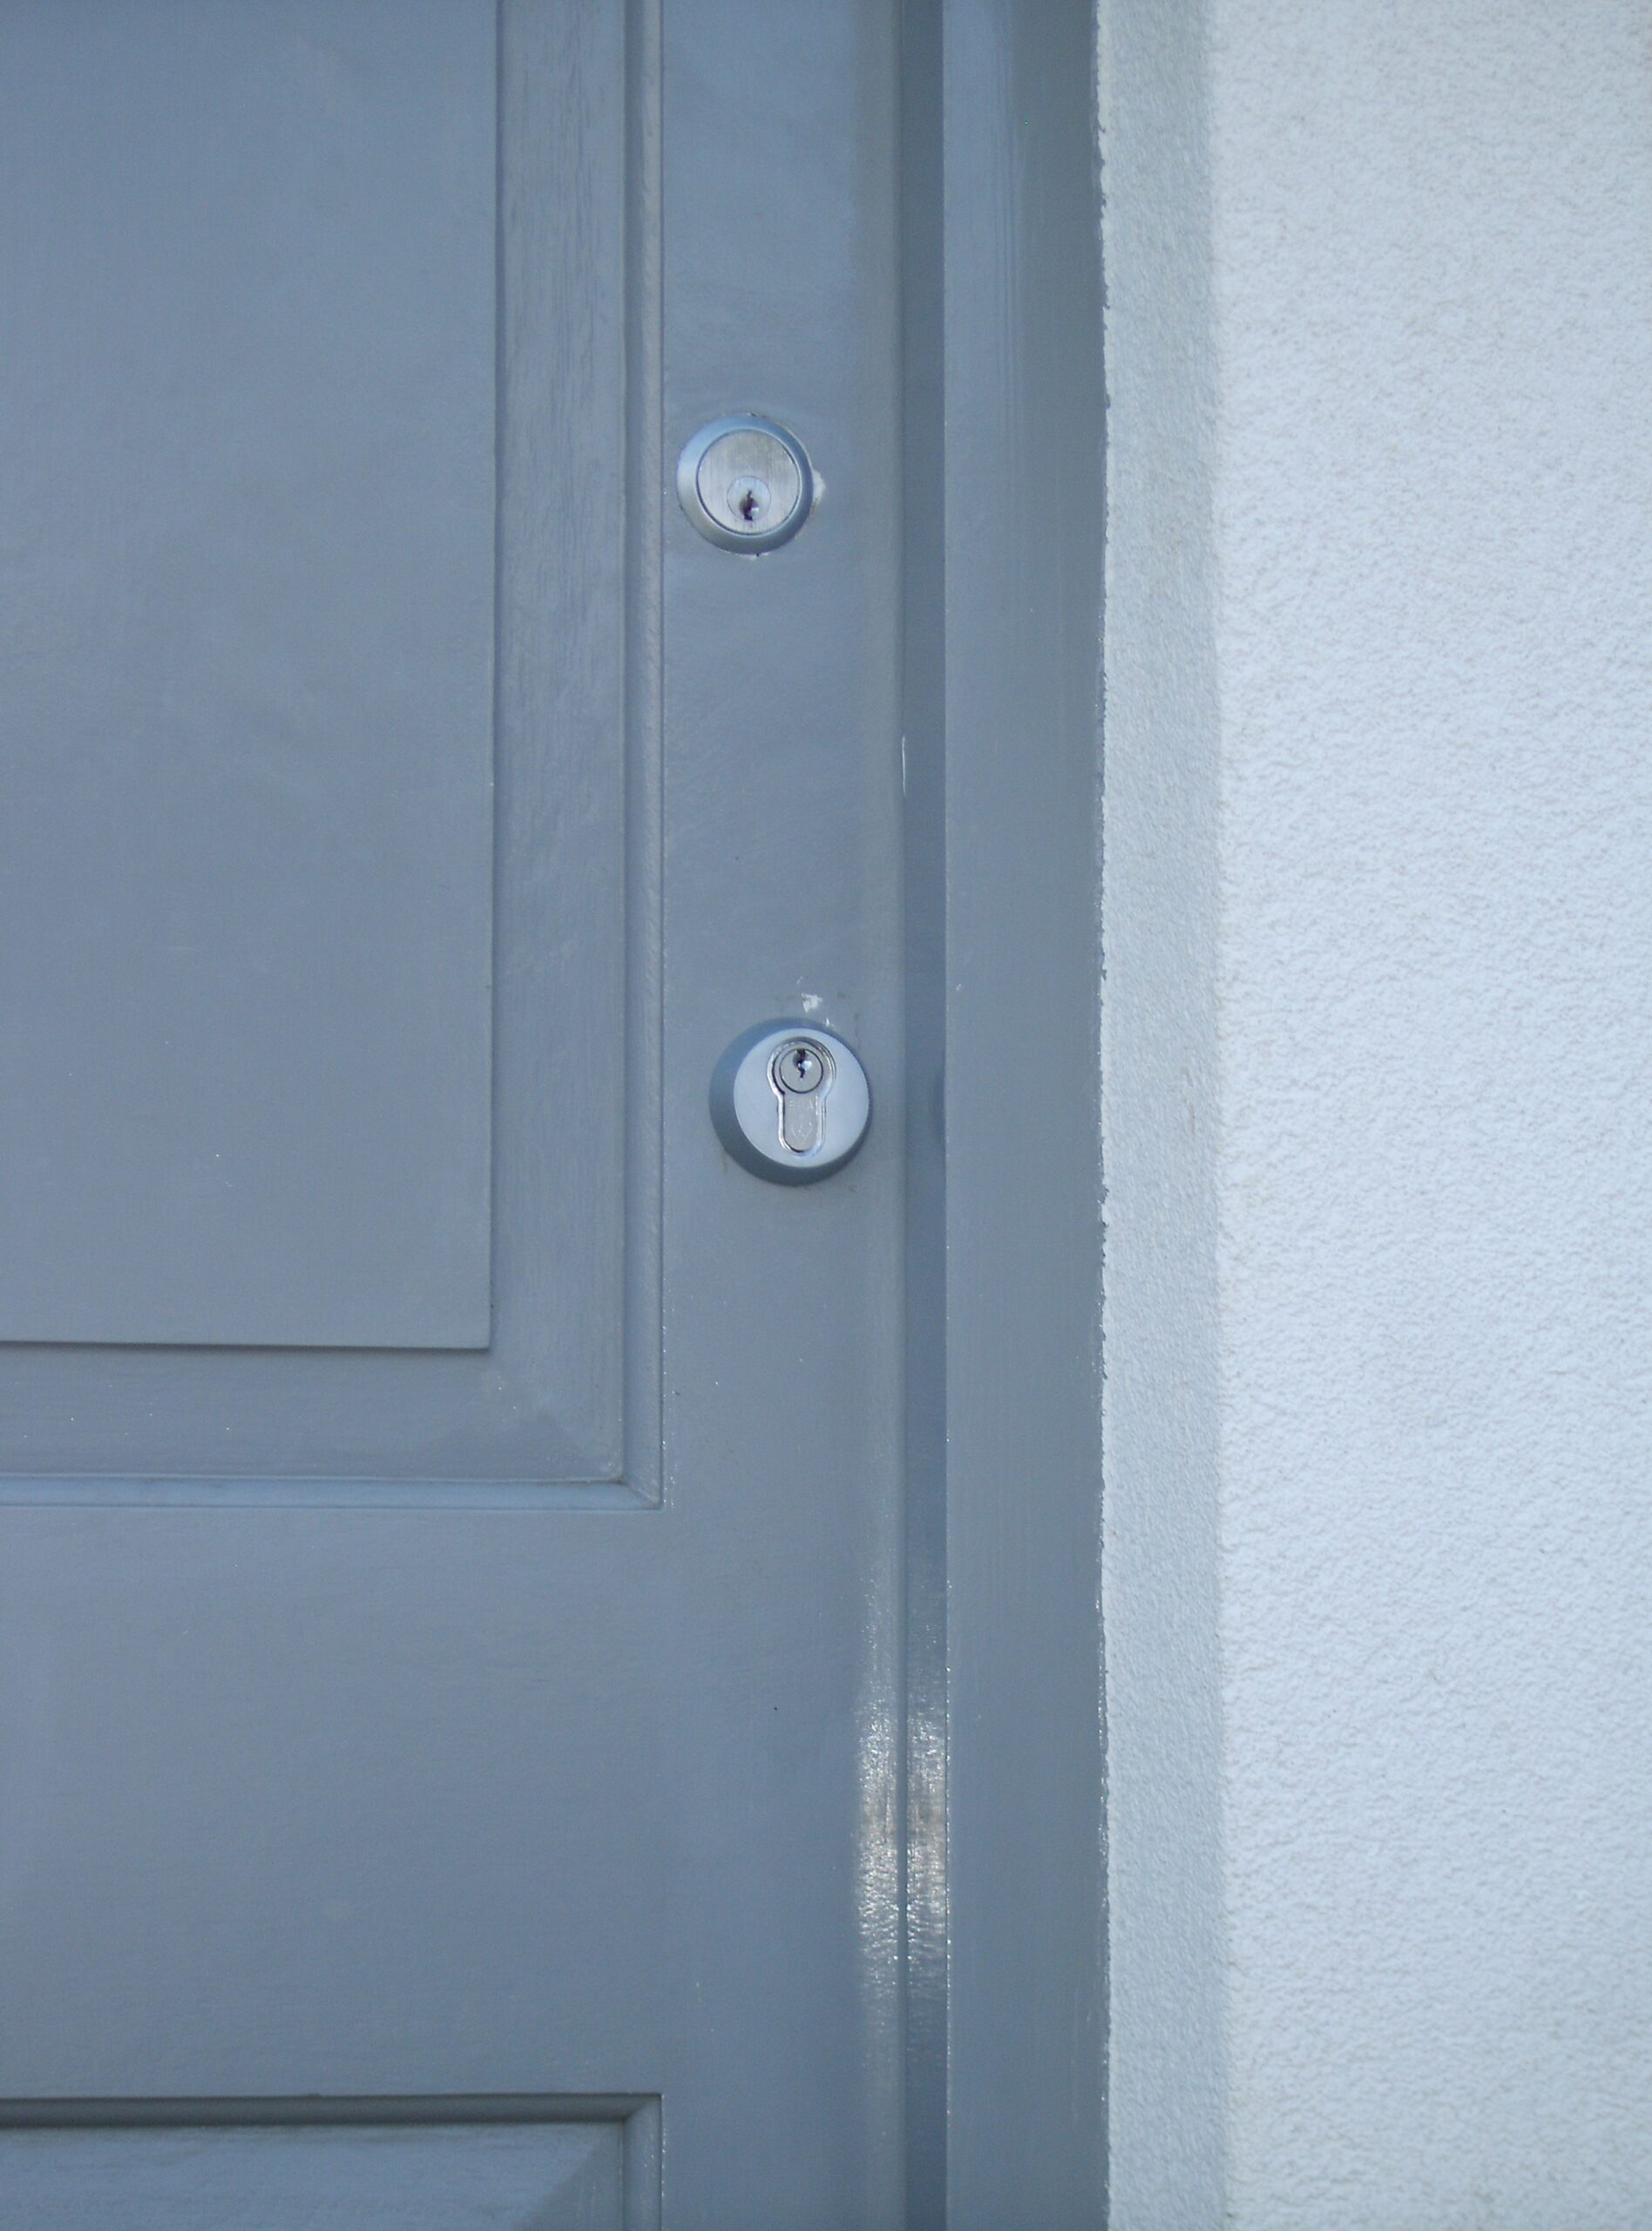 keyed alike locks wooden door